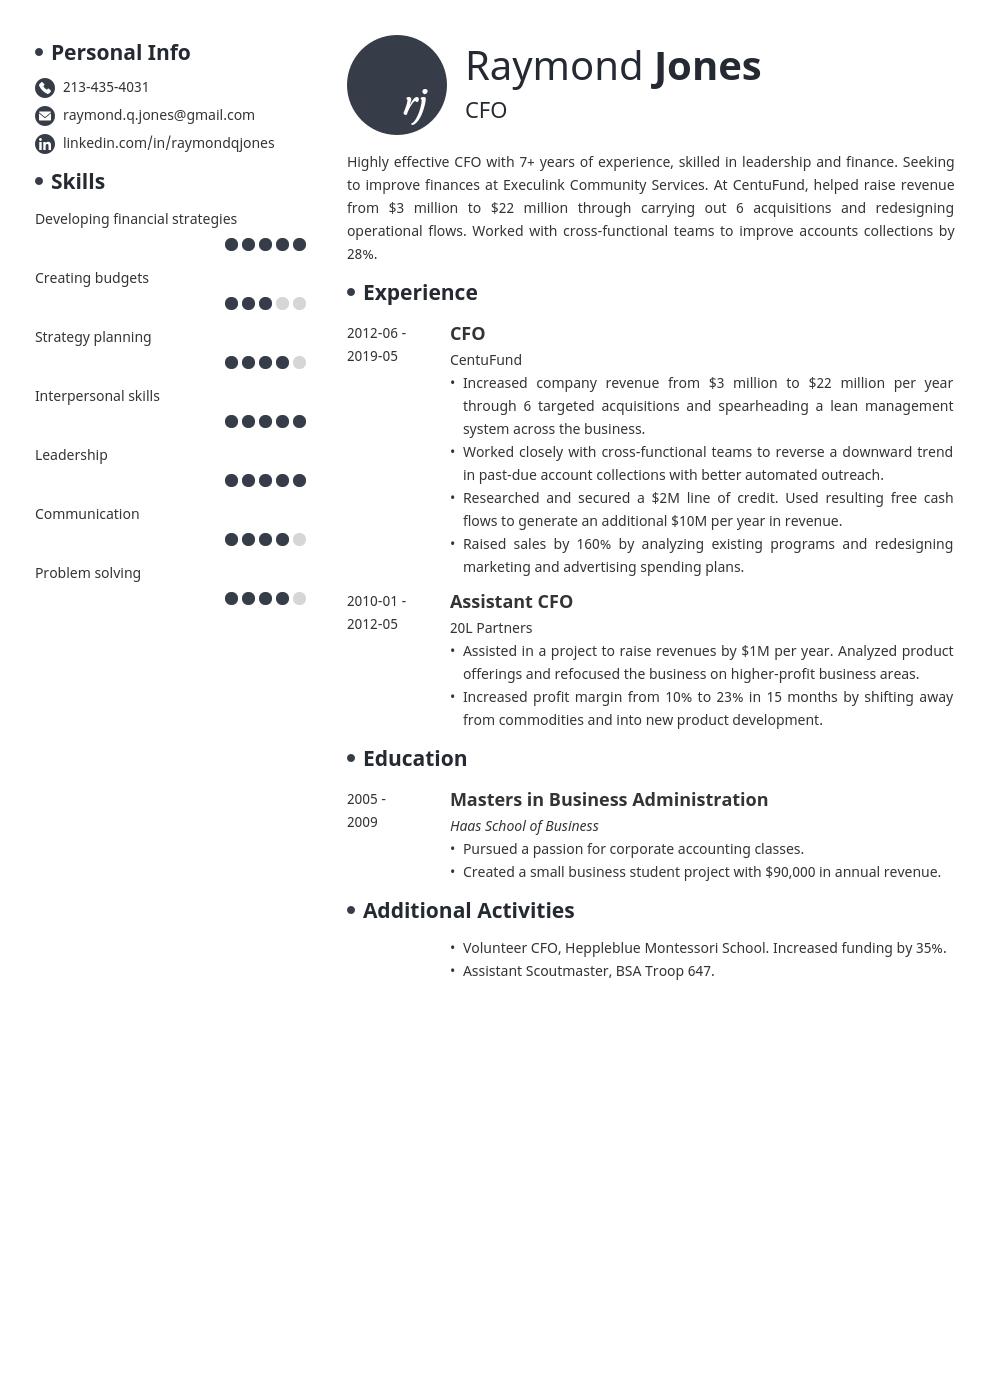 Cfo Resume Example Template Initials Resume Examples Job Resume Examples Resume Layout